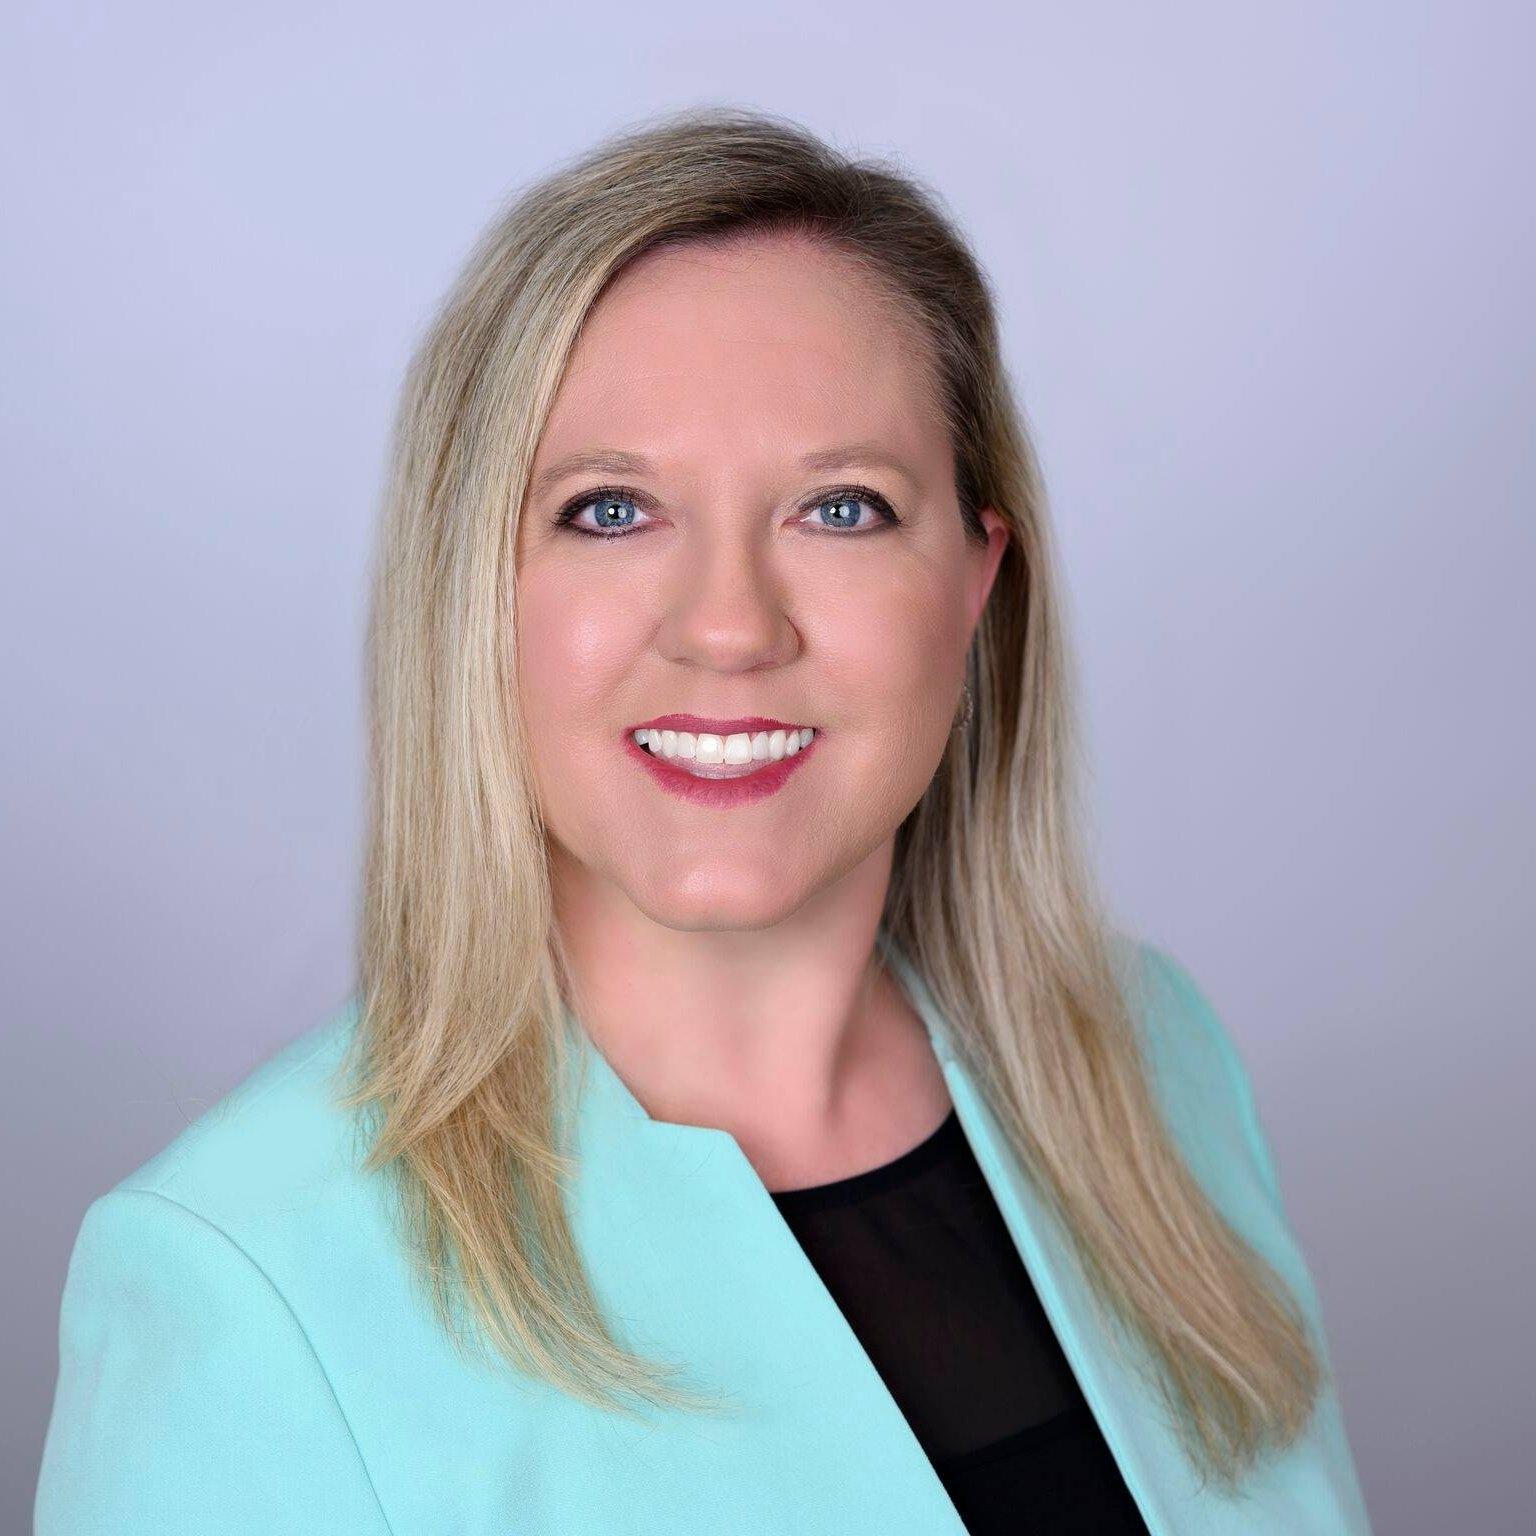 Heather Rankin, DNP, MBA, CRNA